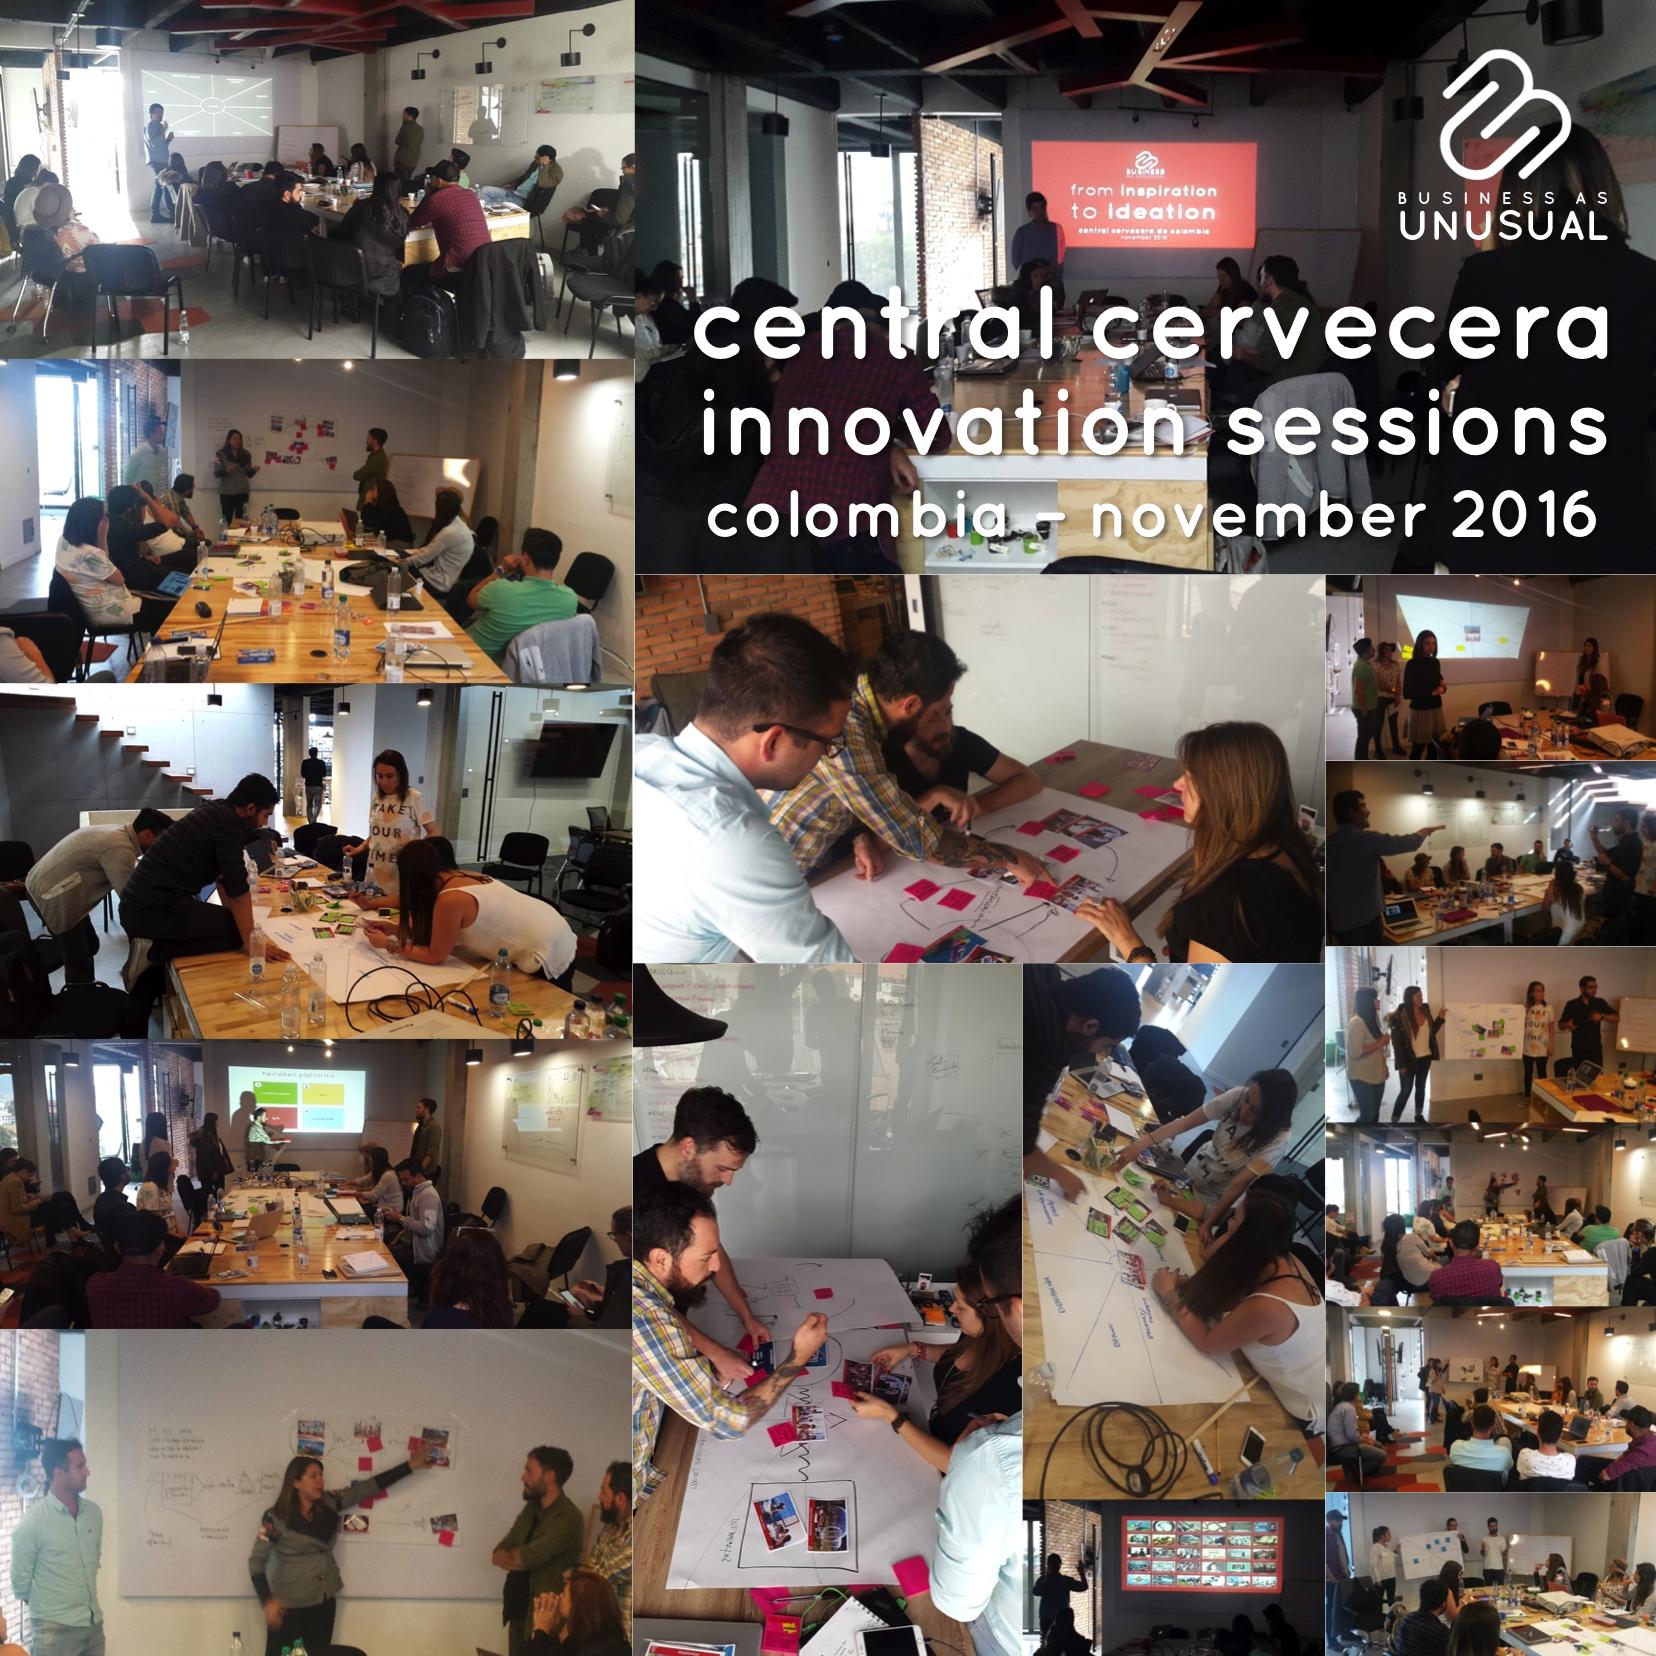 2017-01-14-central-cervecera-colombia-2016